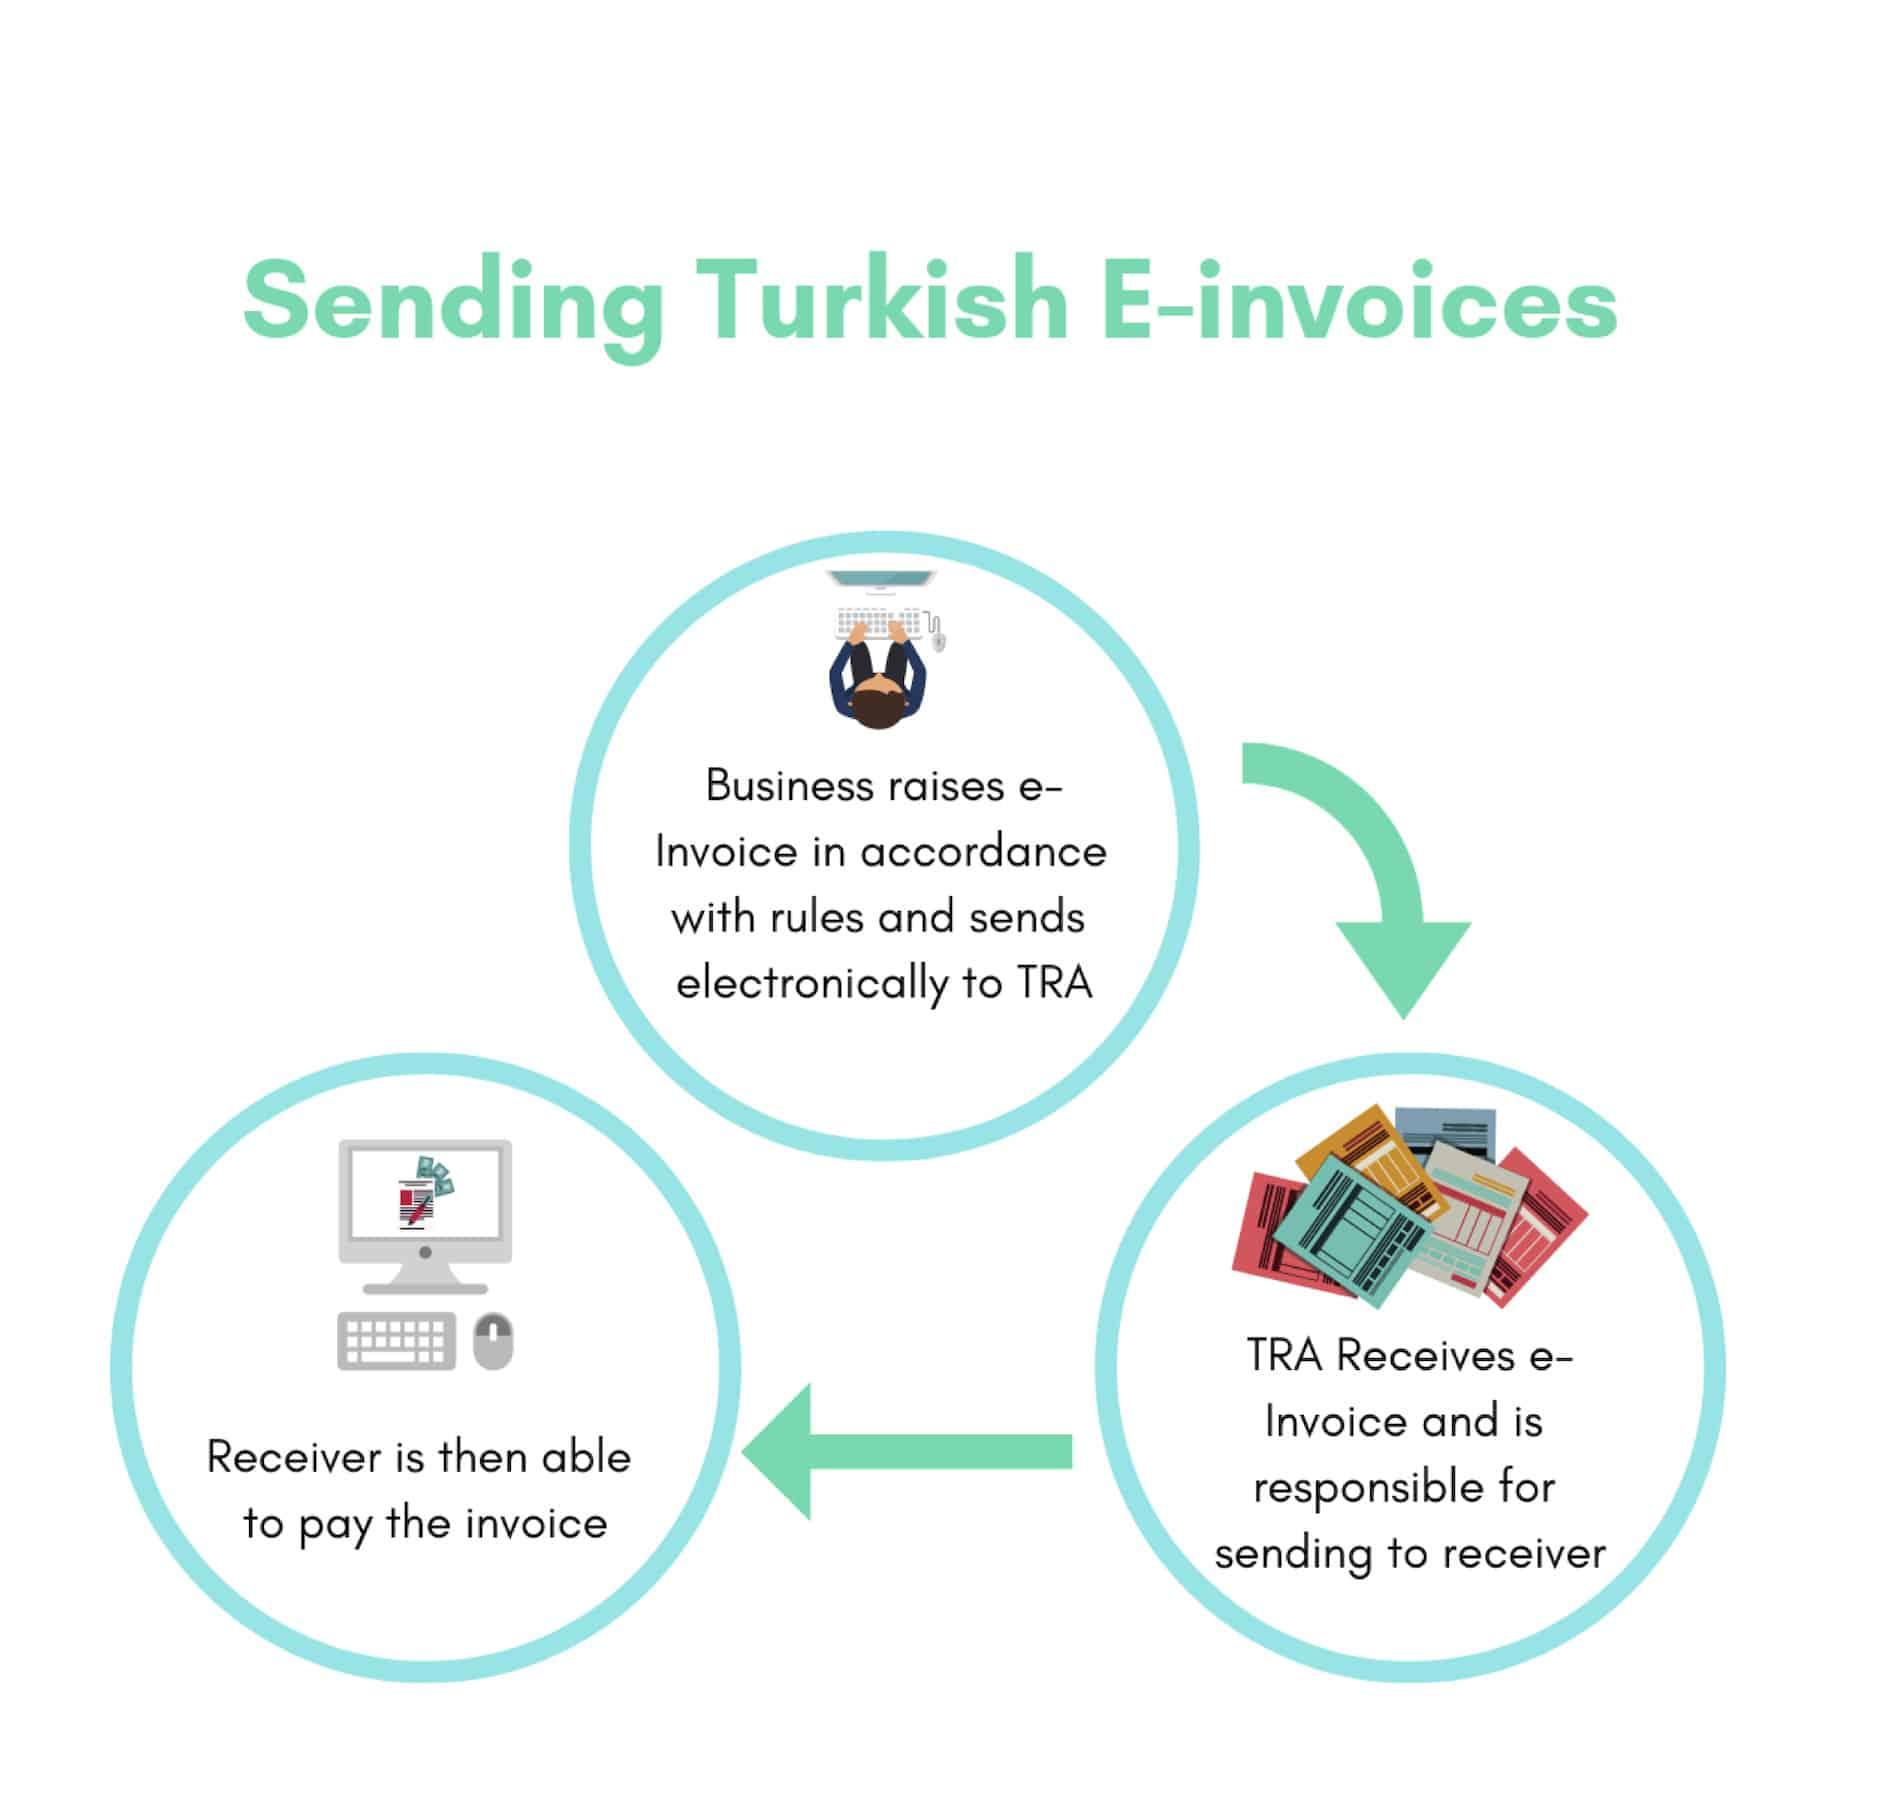 Sending Turkish e-Invoices